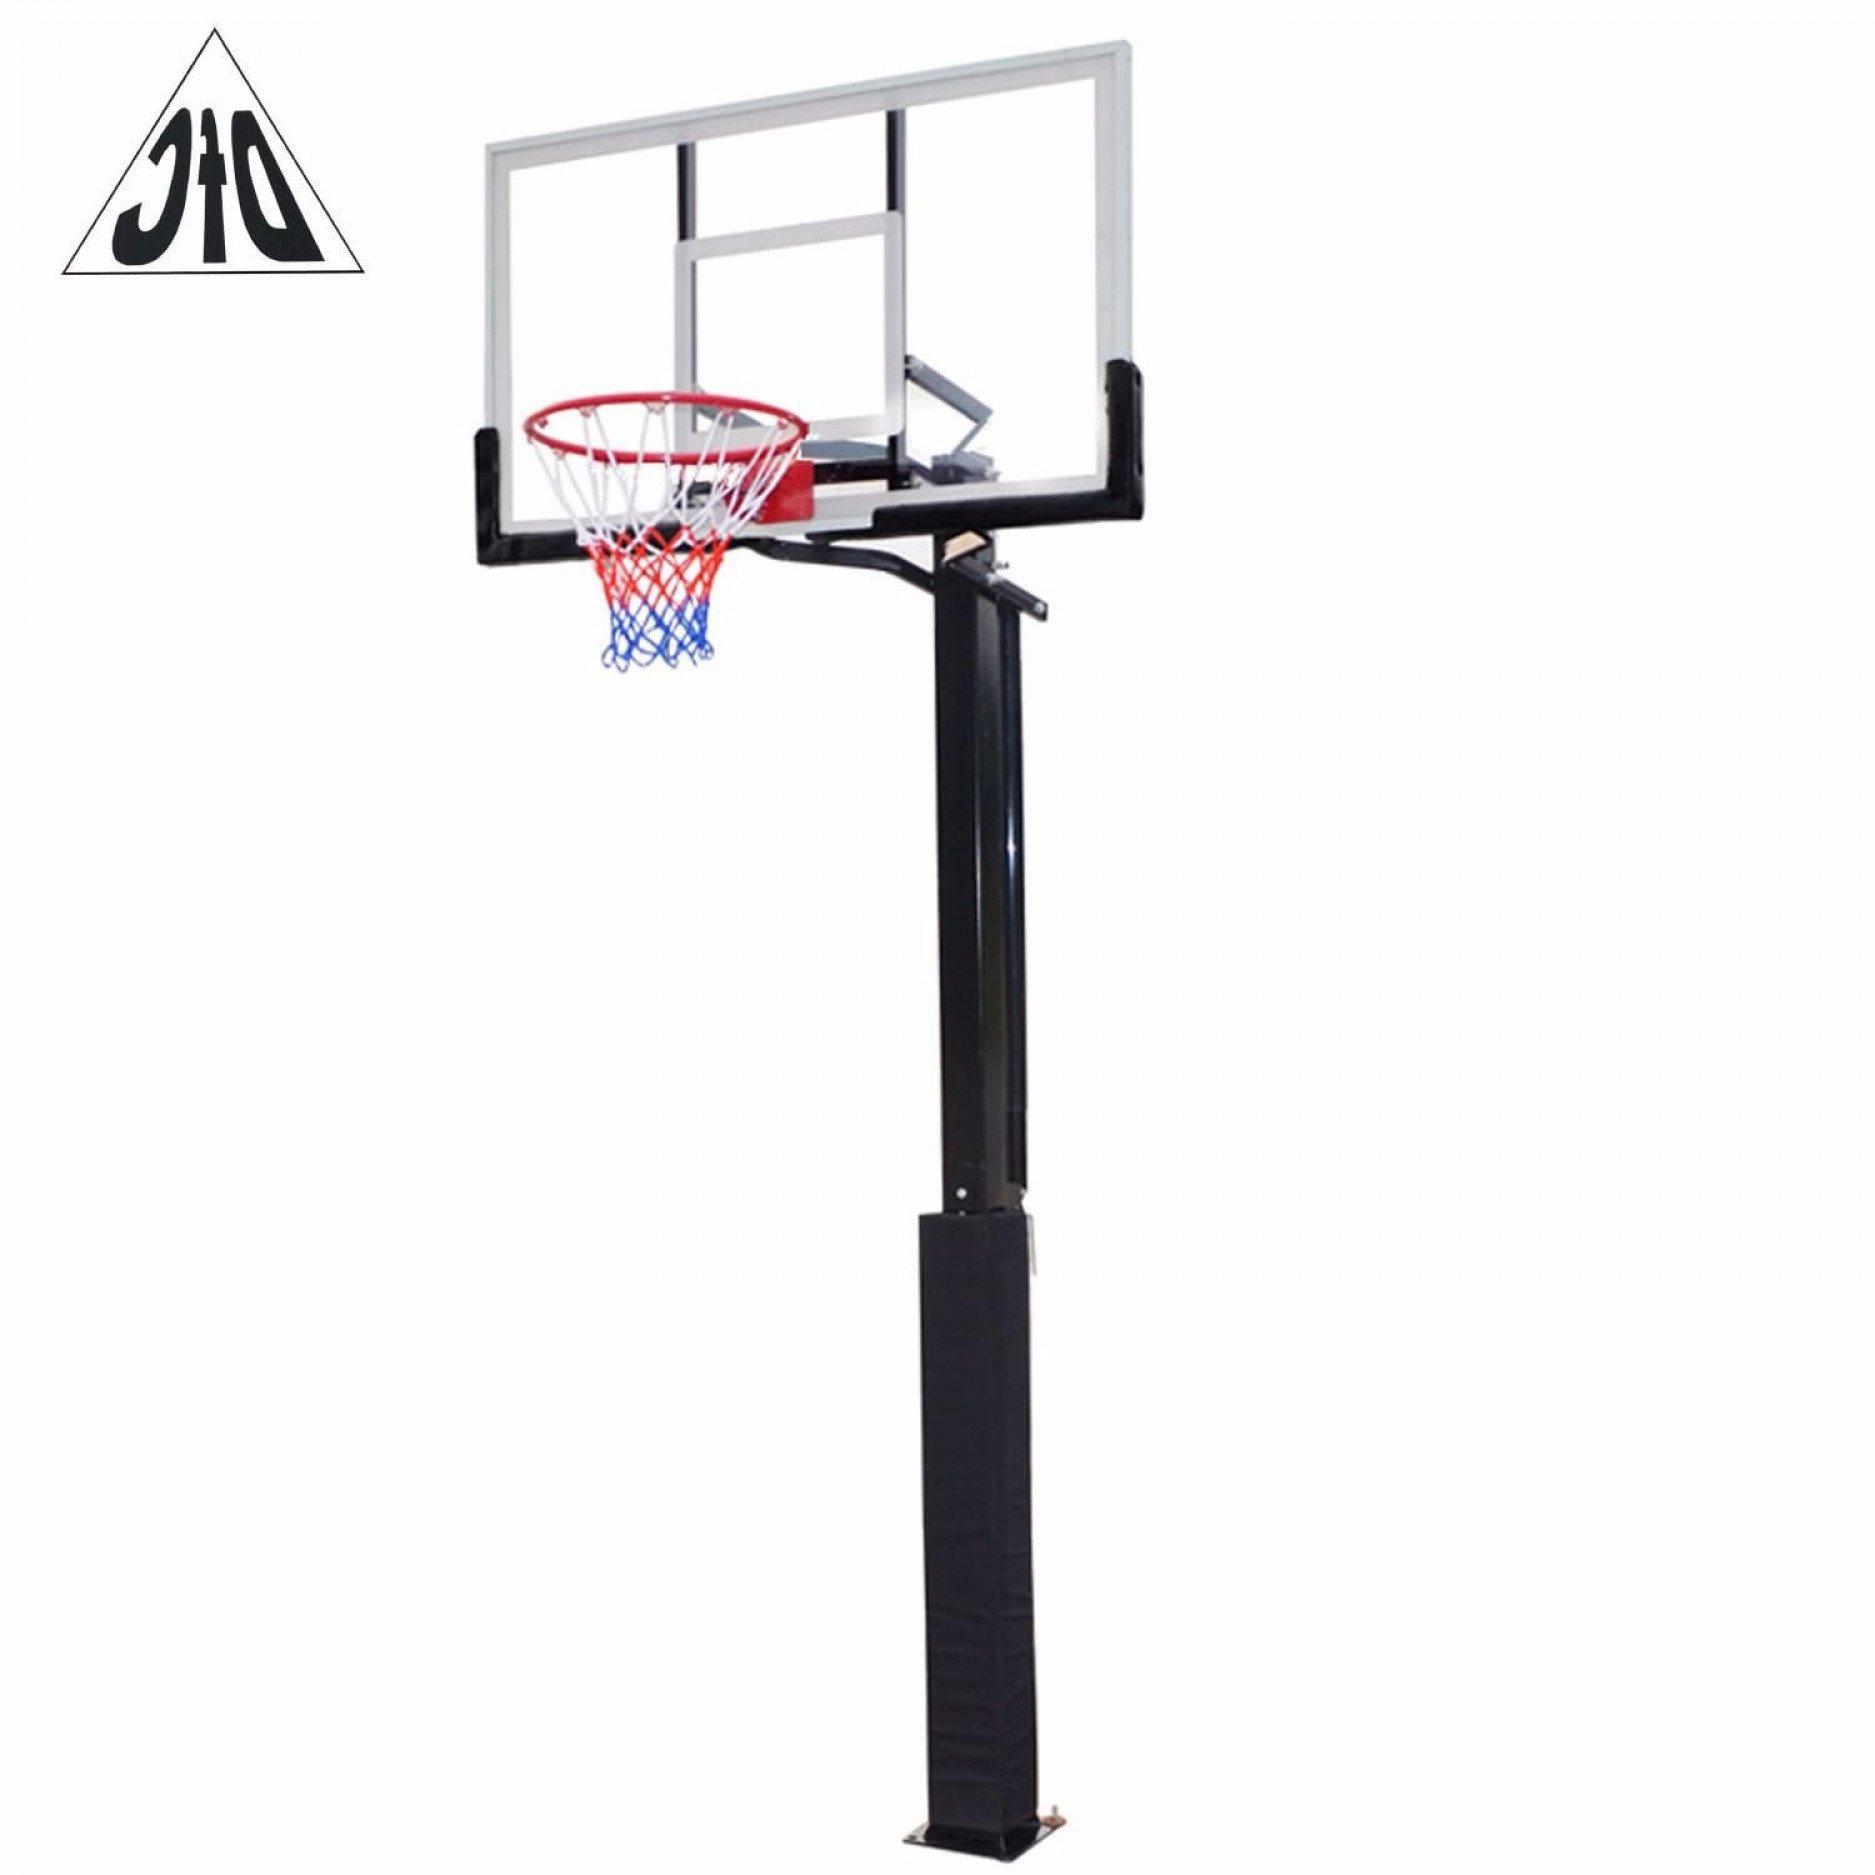 "Стационарная баскетбольная стойка 56"" DFC ING56A"